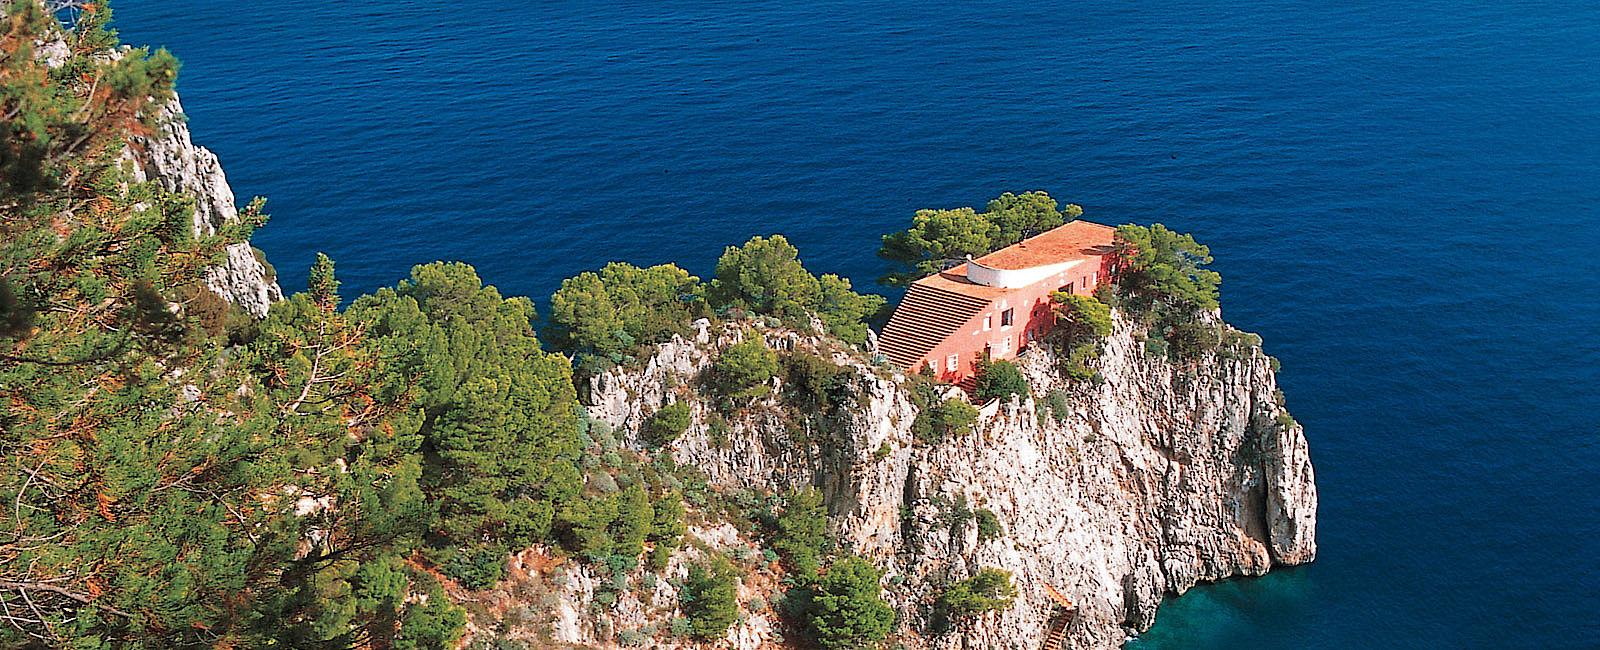 Capri - Connoisseur Circle Destinationen im Check